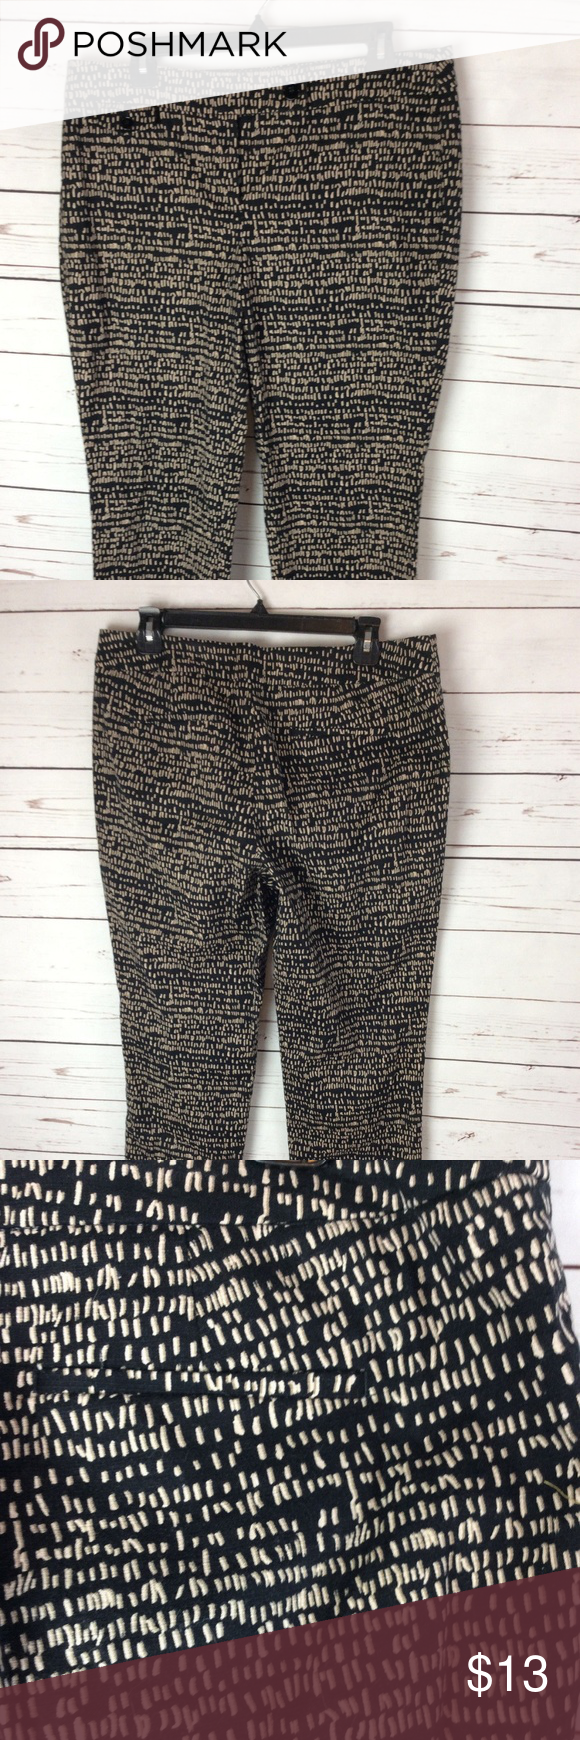 Ann Taylor Loft Womens Capri Pants Size 10 Crop 100 money